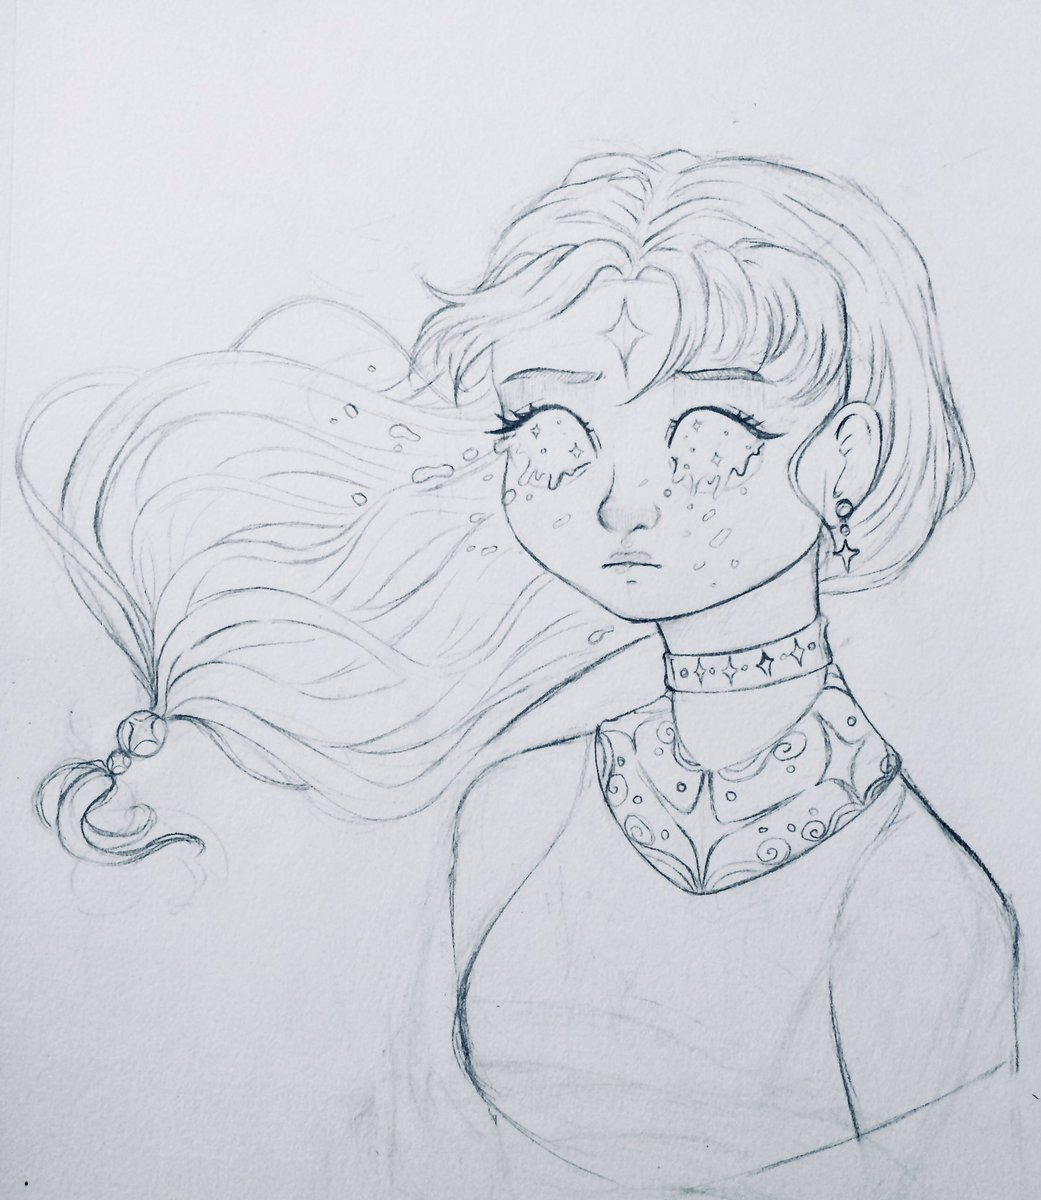 #wip #drawing #sketch #art #myart #MyArtwork https://t.co/oG5L4W2OrR